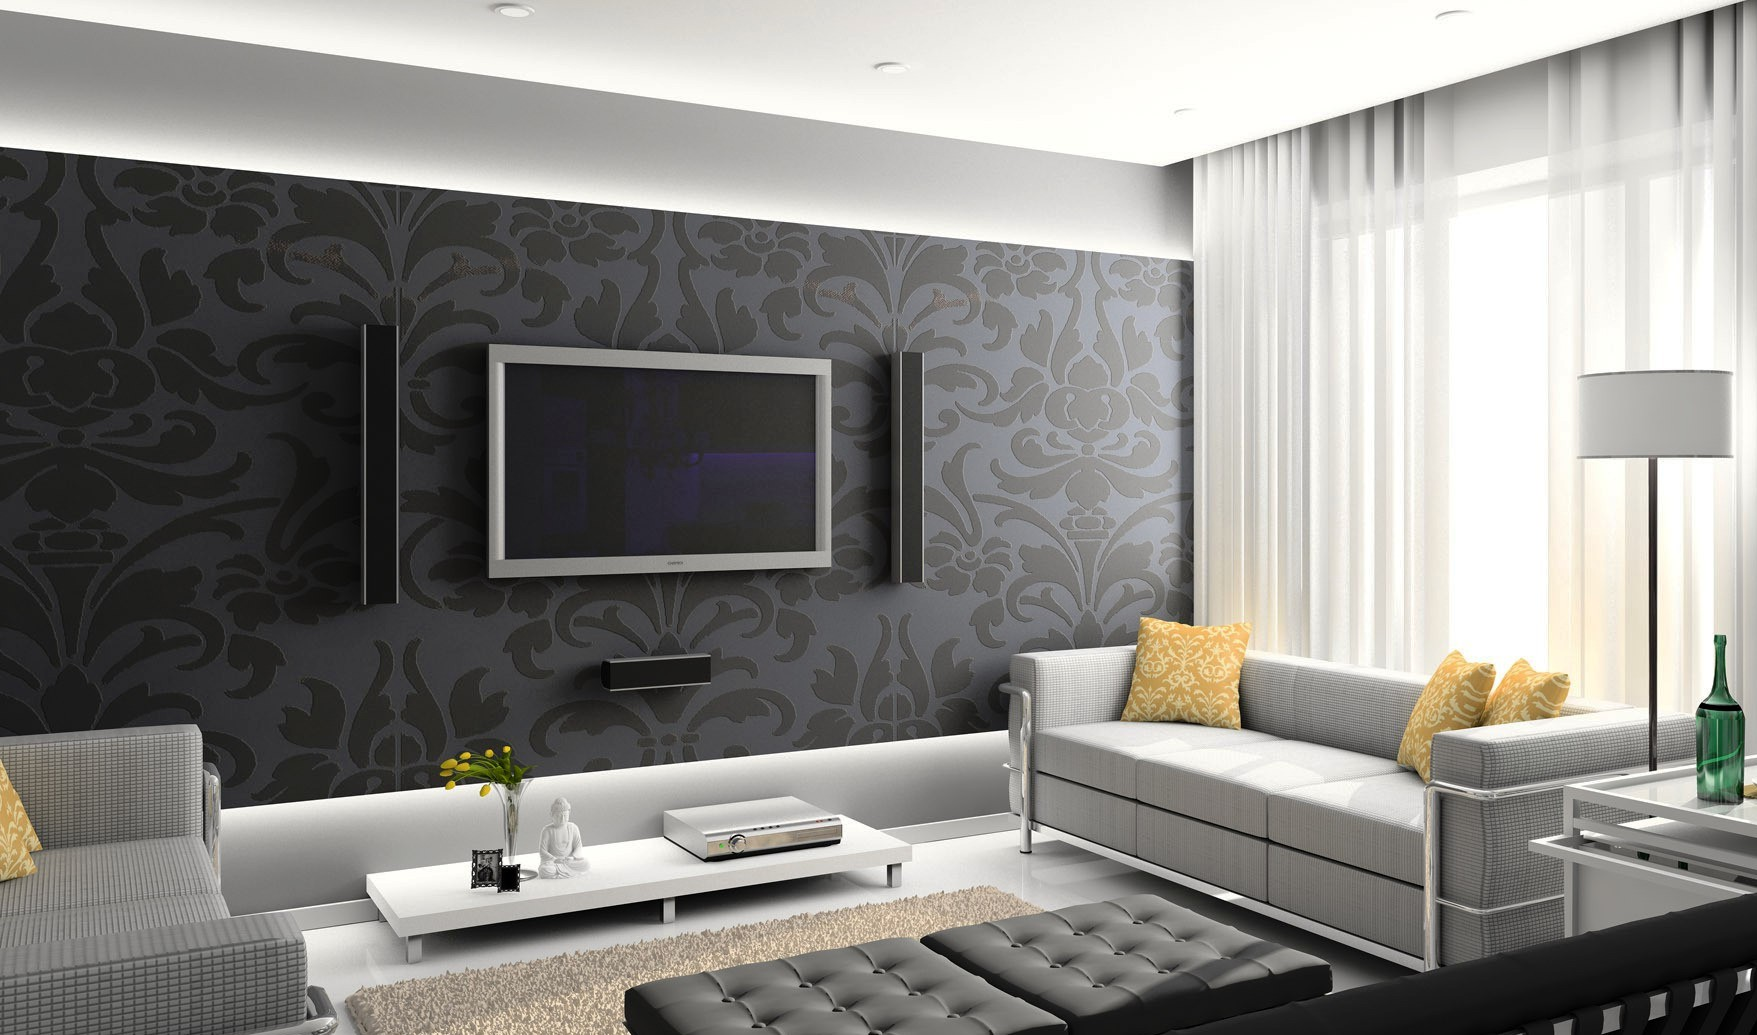 Дизайн комнат обоями фото